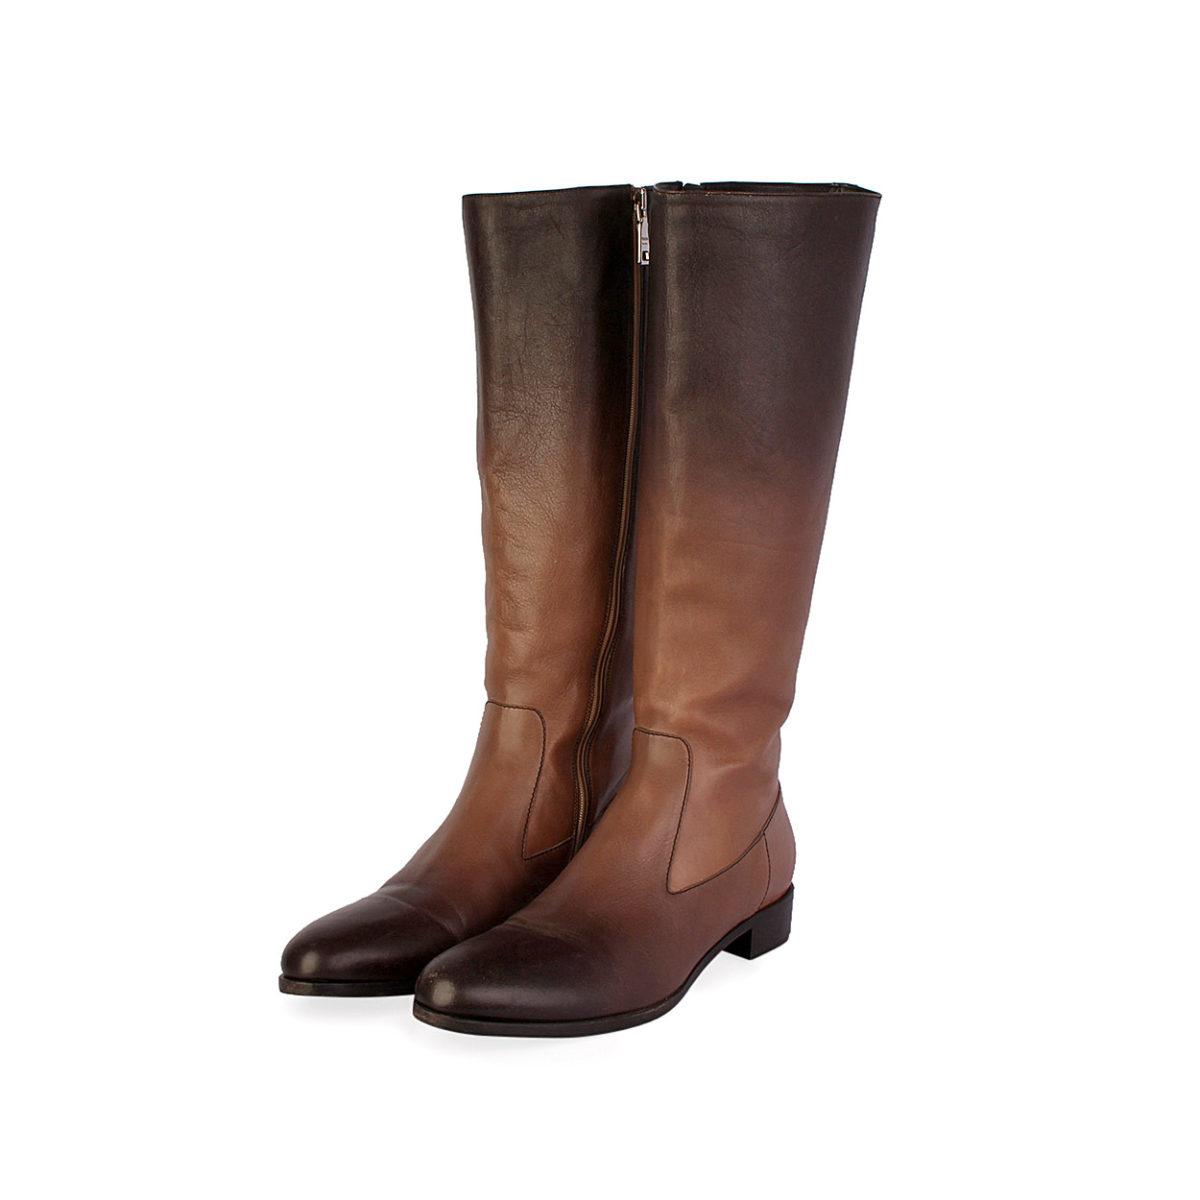 Pre-owned - Boots Prada Buy Online Discount Amazon Outlet Locations Cheap Online Big Sale For Sale DqOUuRhZ